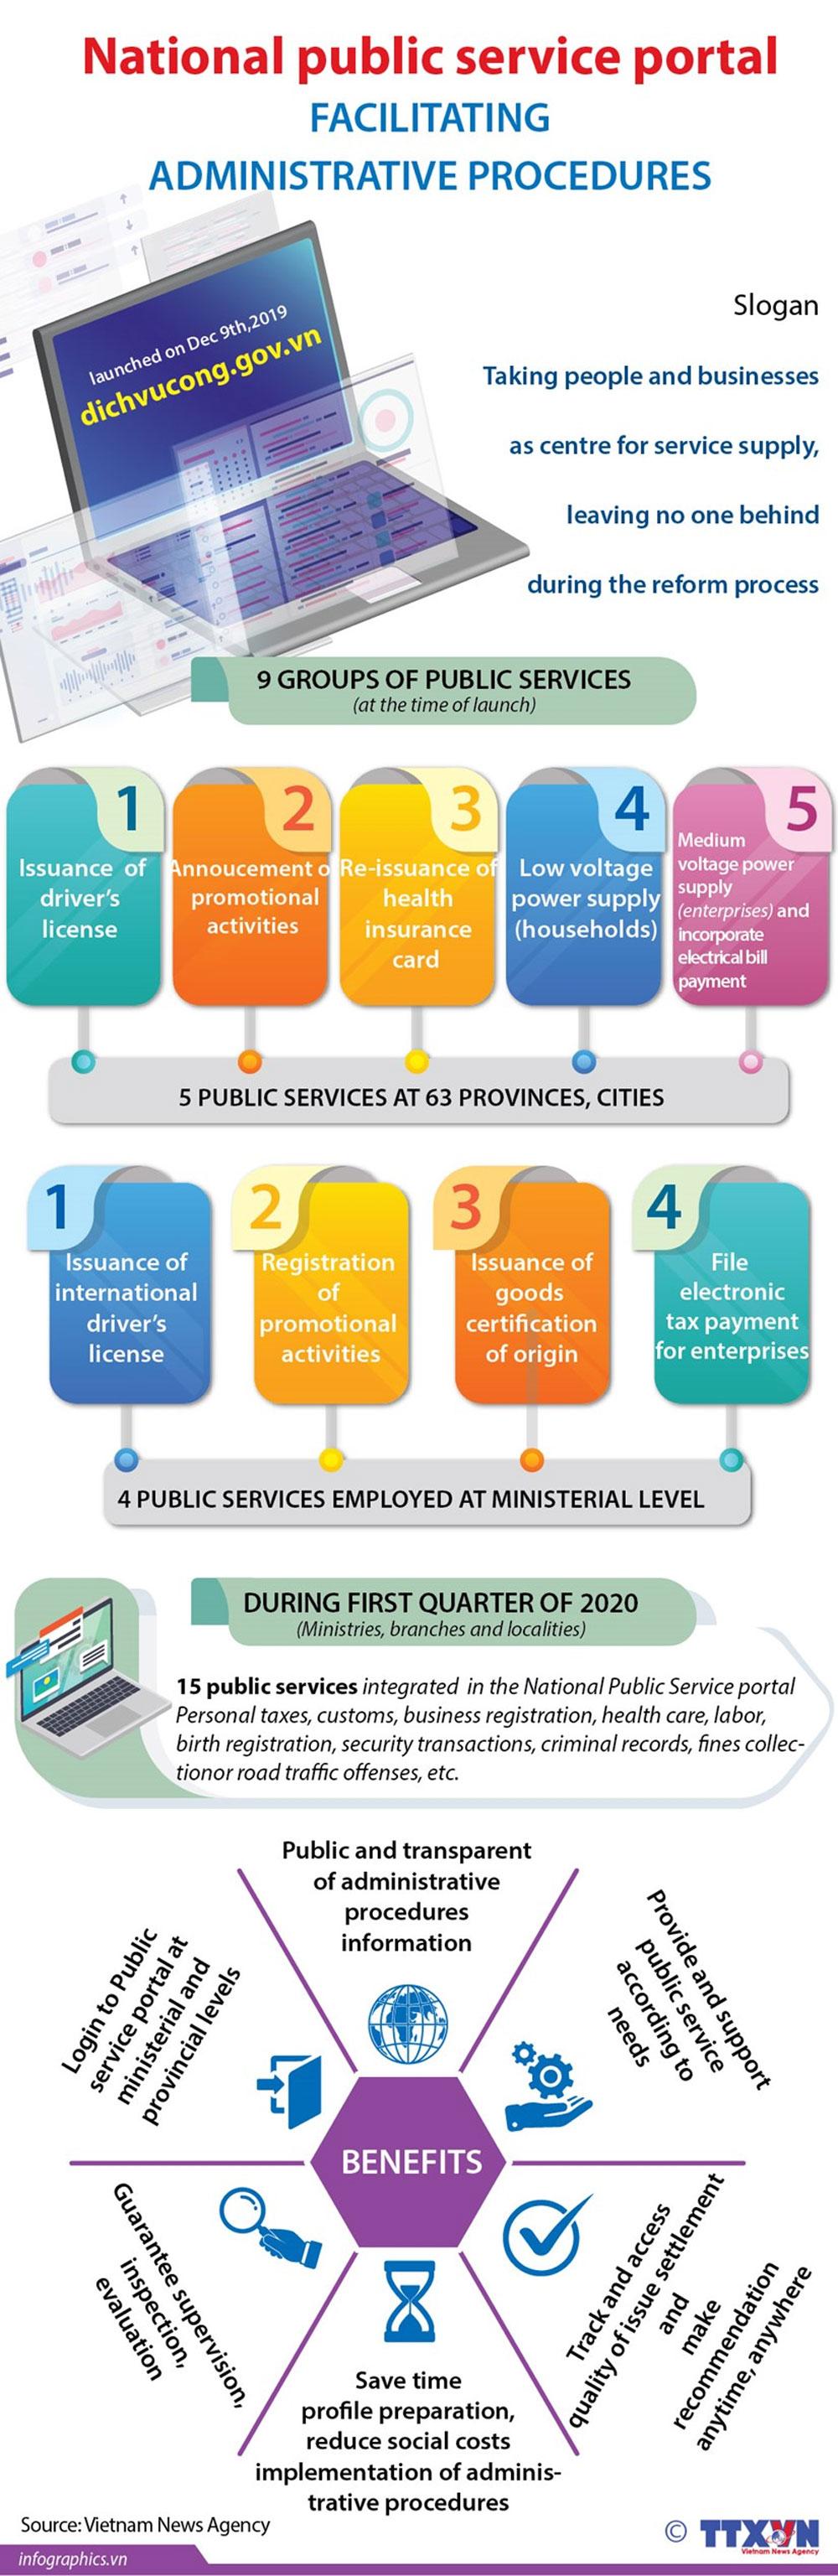 National Public Service Portal, launching ceremony, electronic platform, nine months of construction